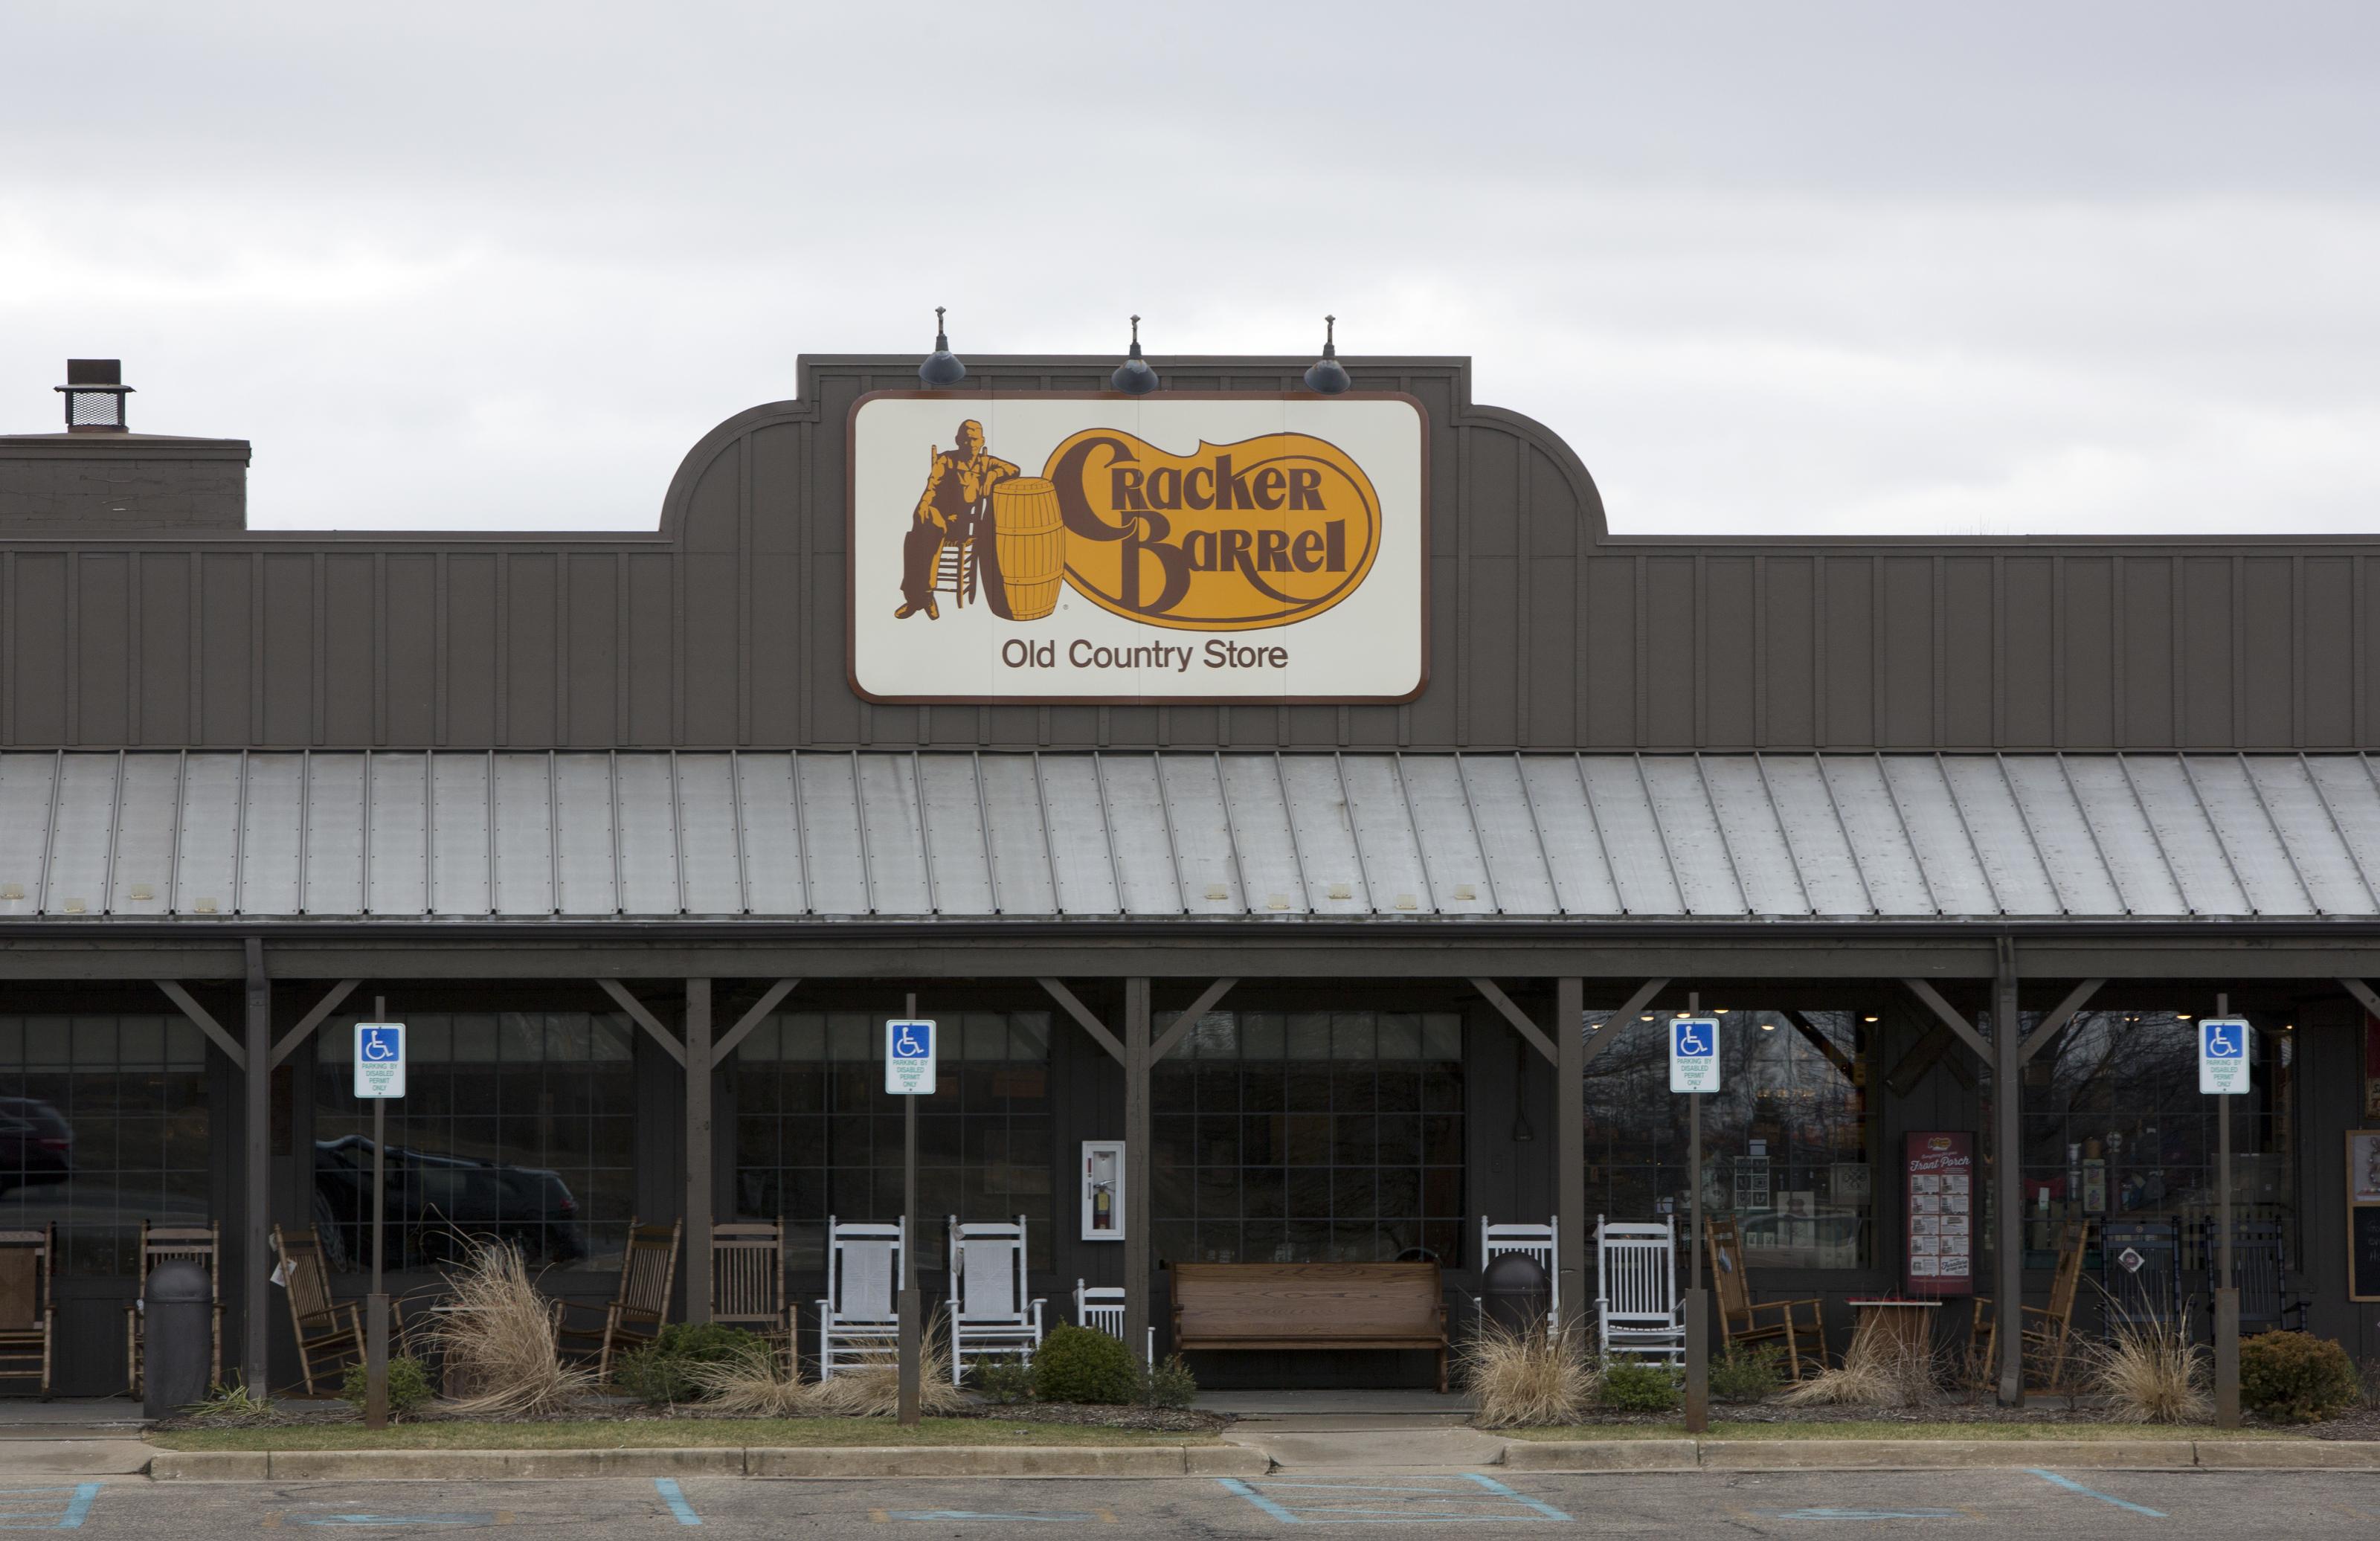 Cracker Barrel: Is the restaurant open on Christmas Day 2019?